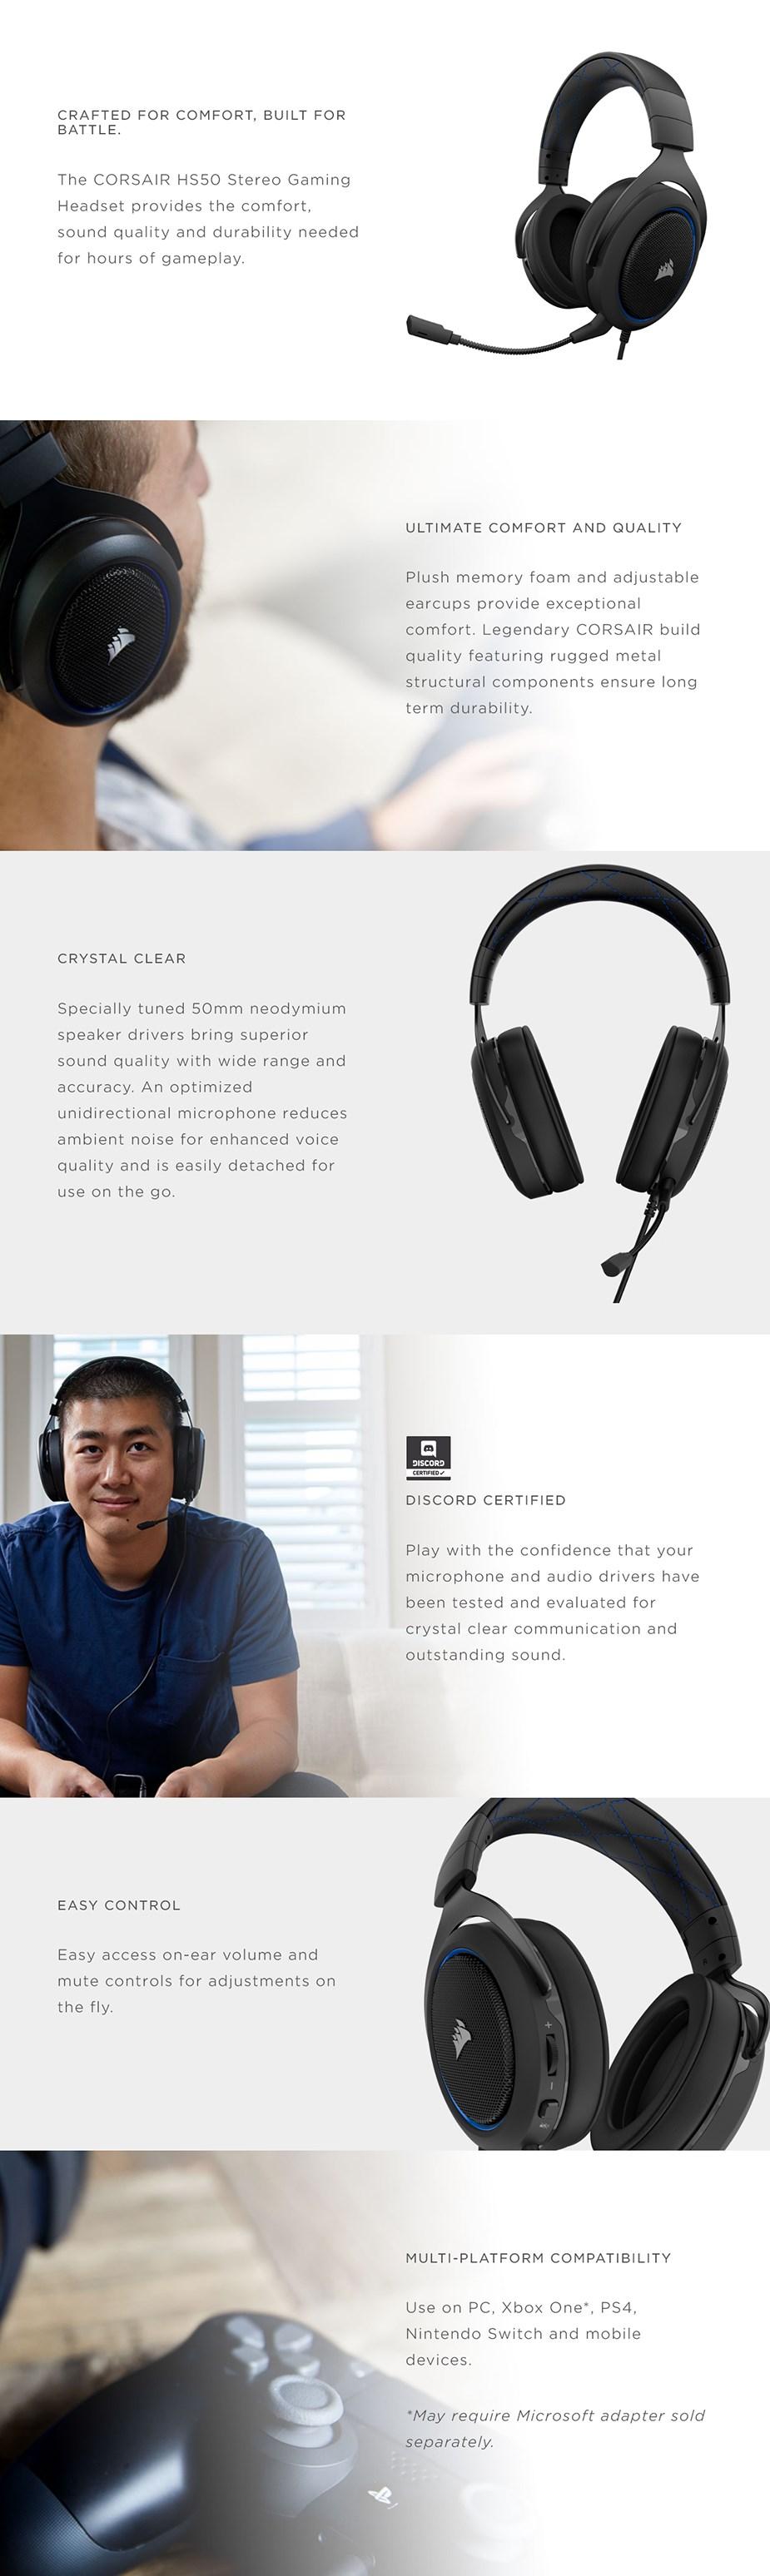 Corsair HS50 Stereo Gaming Headset - Blue - Desktop Overview 1